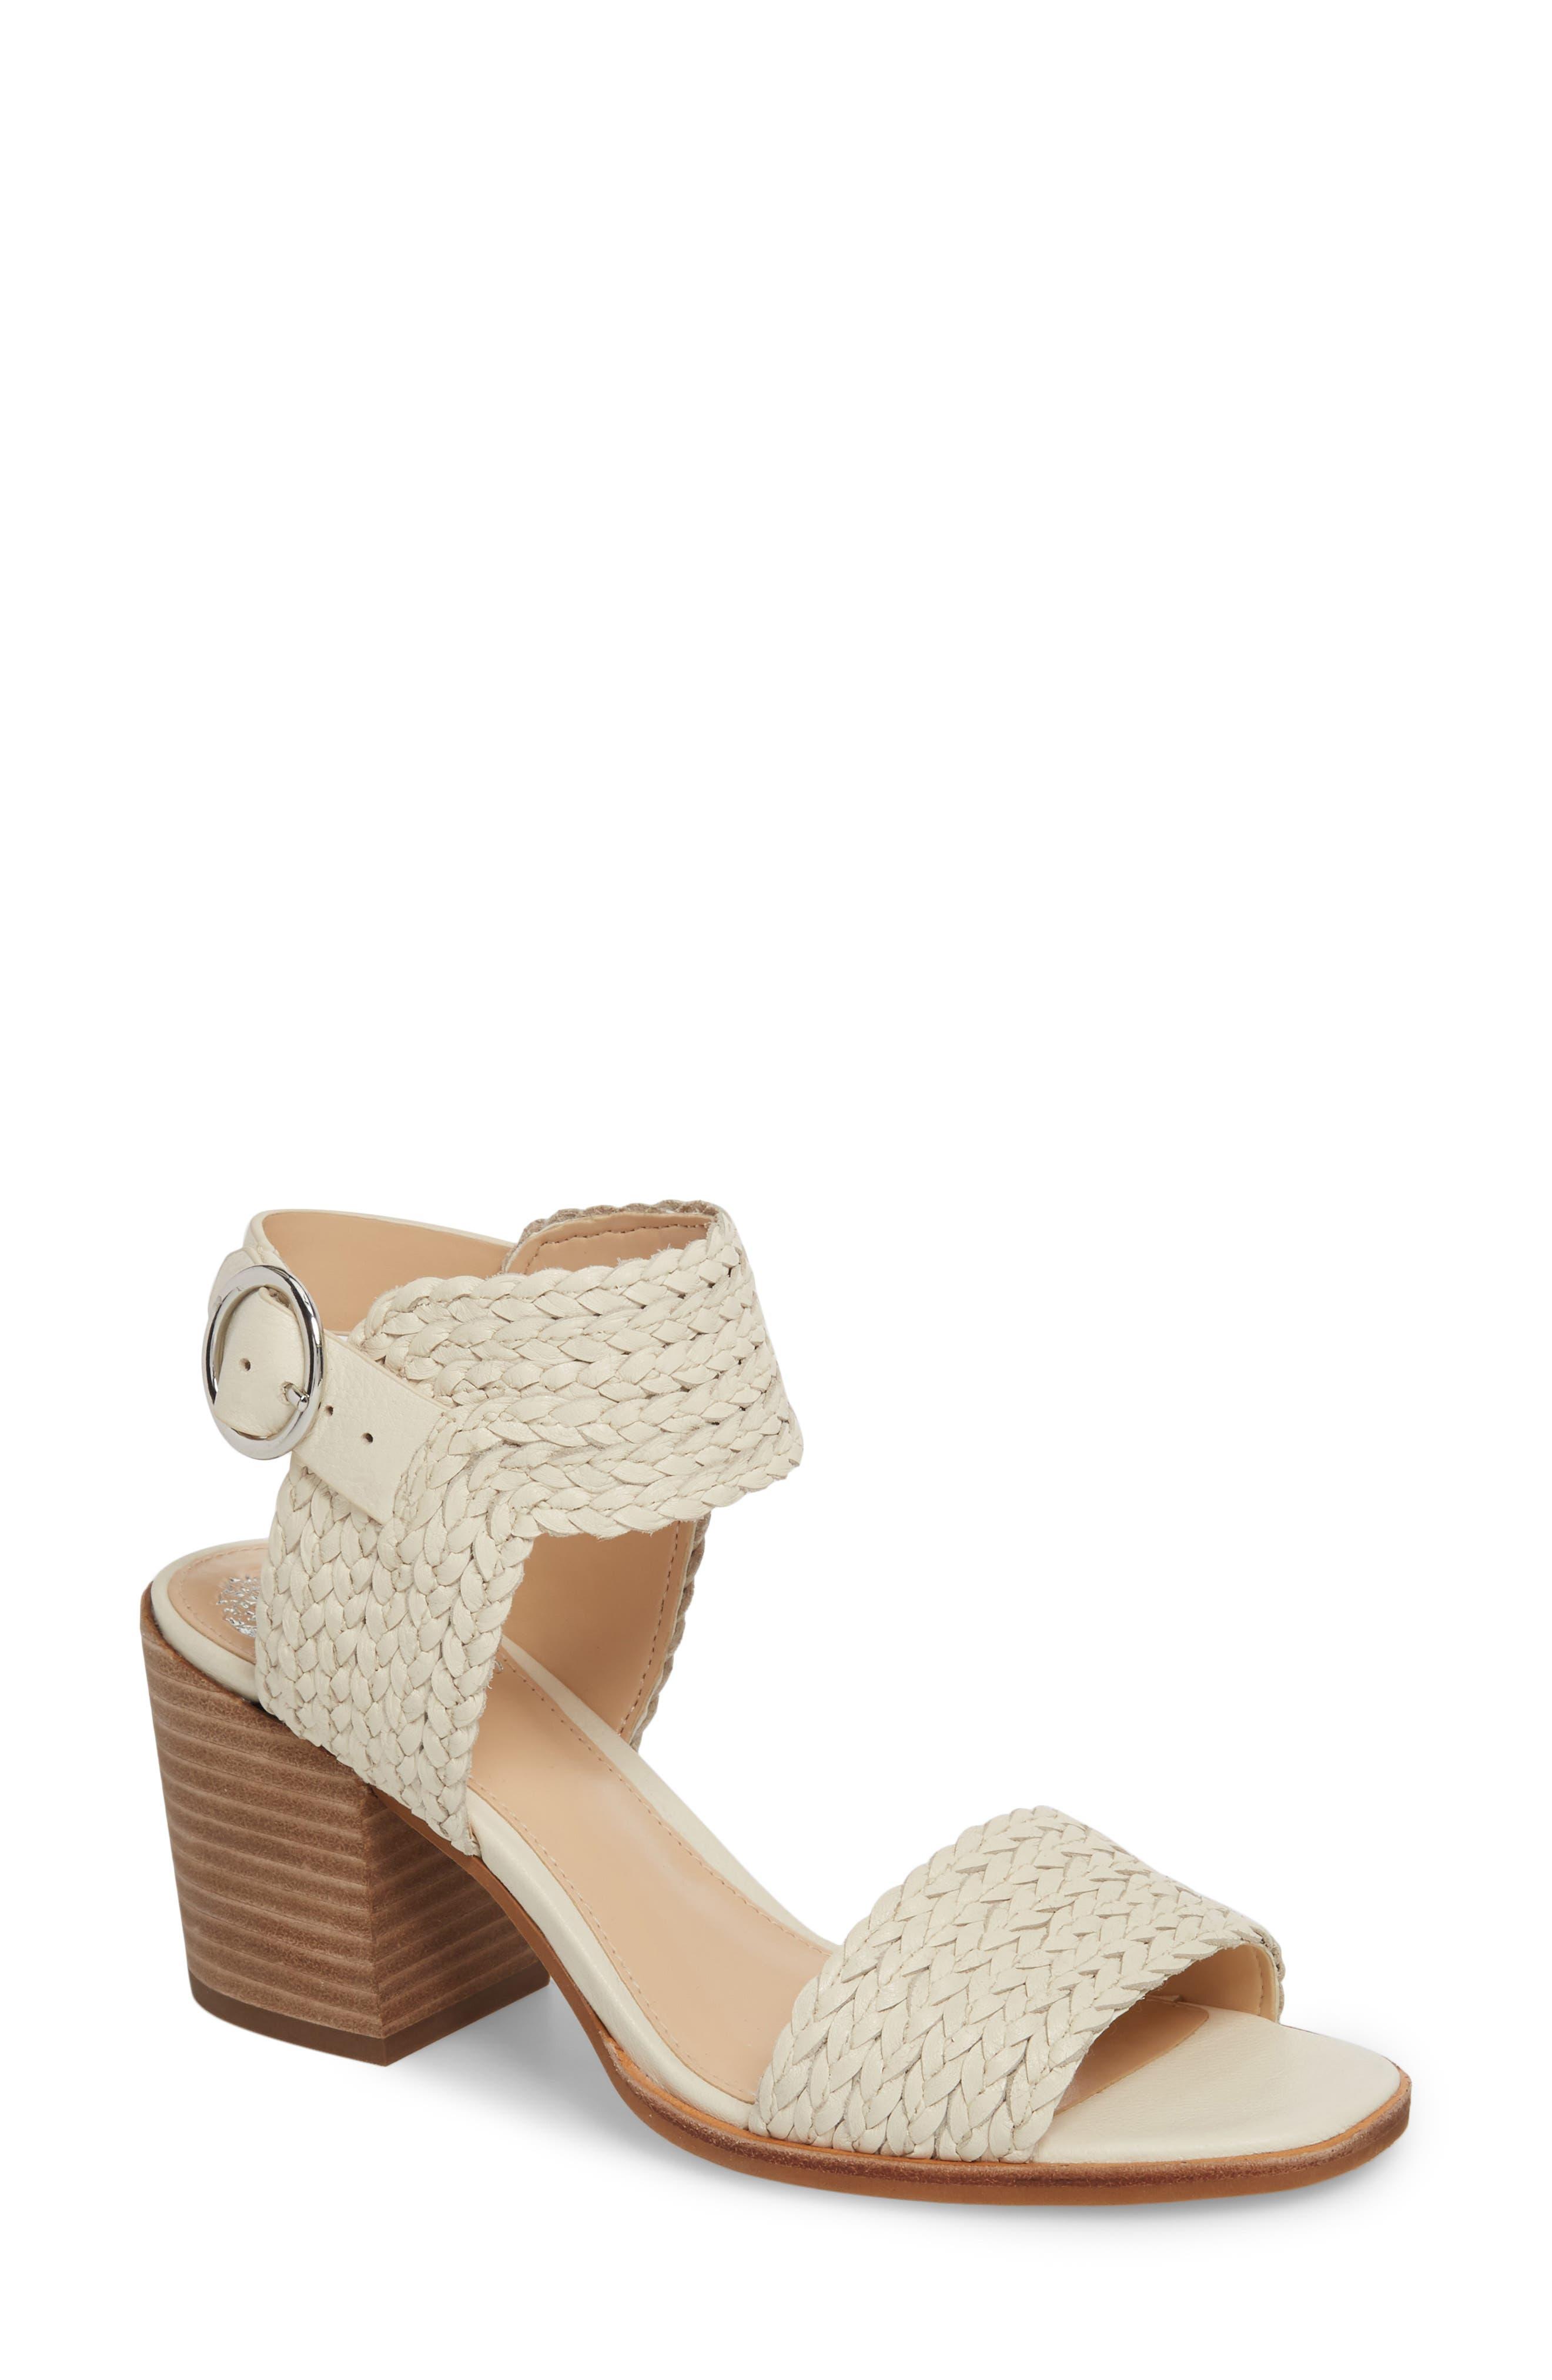 Kolema Sandal,                             Main thumbnail 1, color,                             Vanilla Fabric